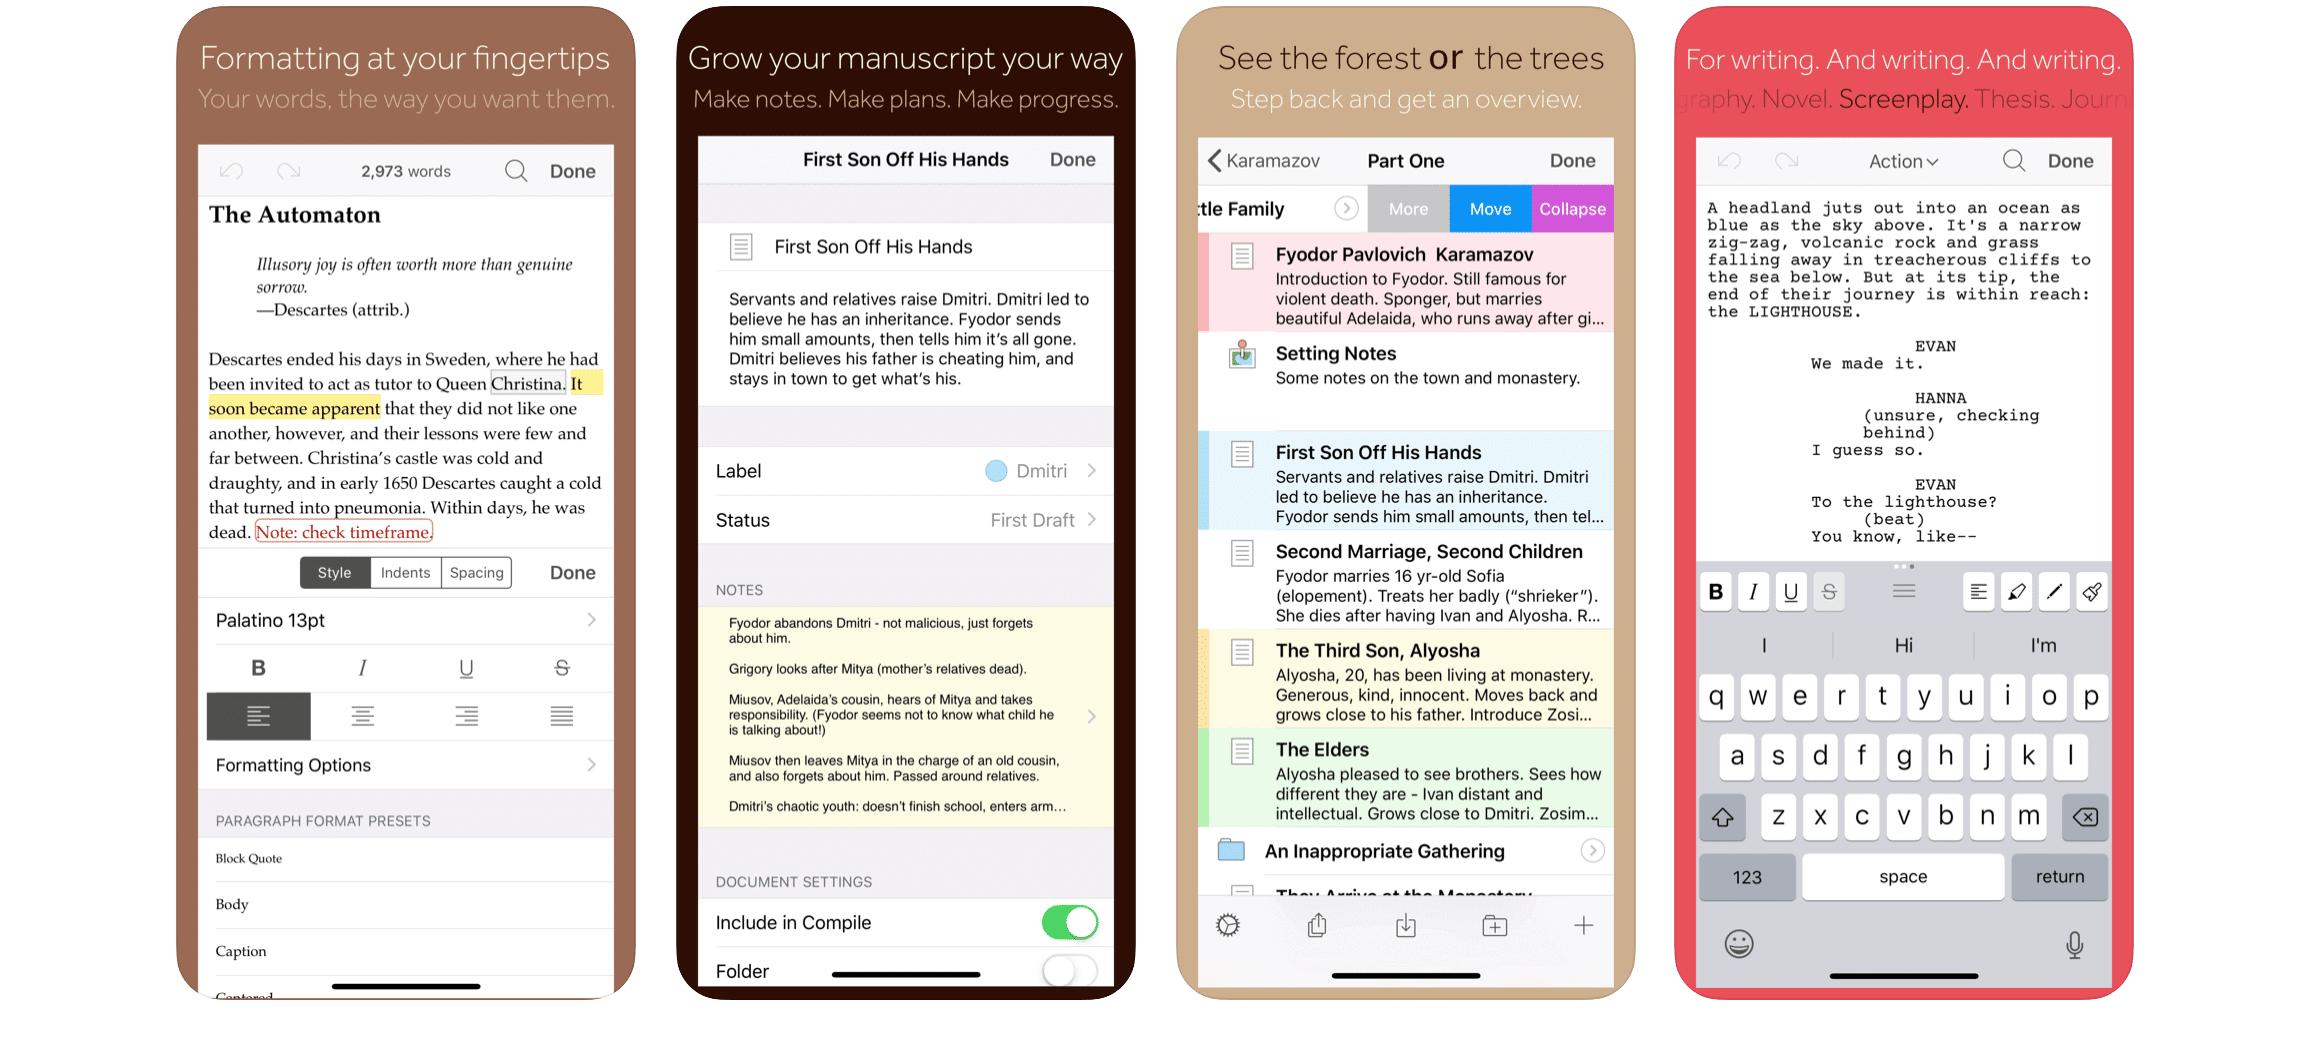 Best-Apps-For-Screenwriters-Scriptation-Scrivener